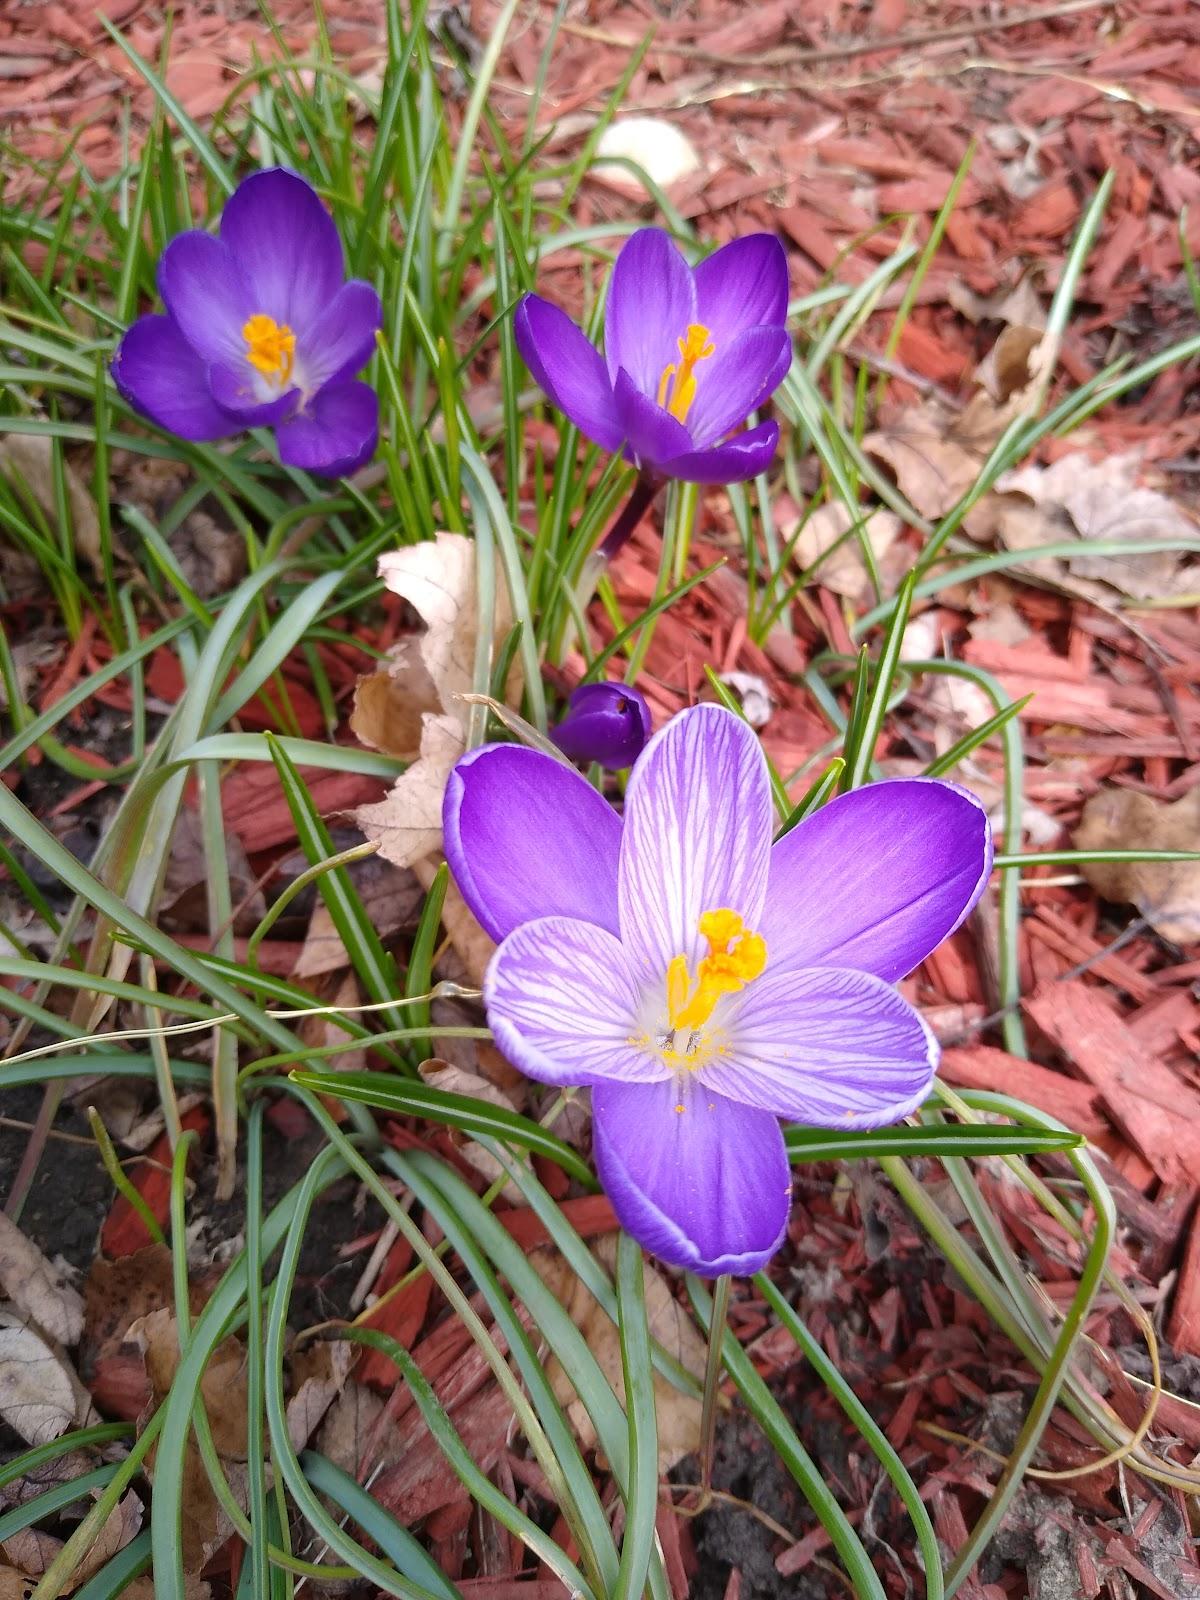 crocus flowers picture